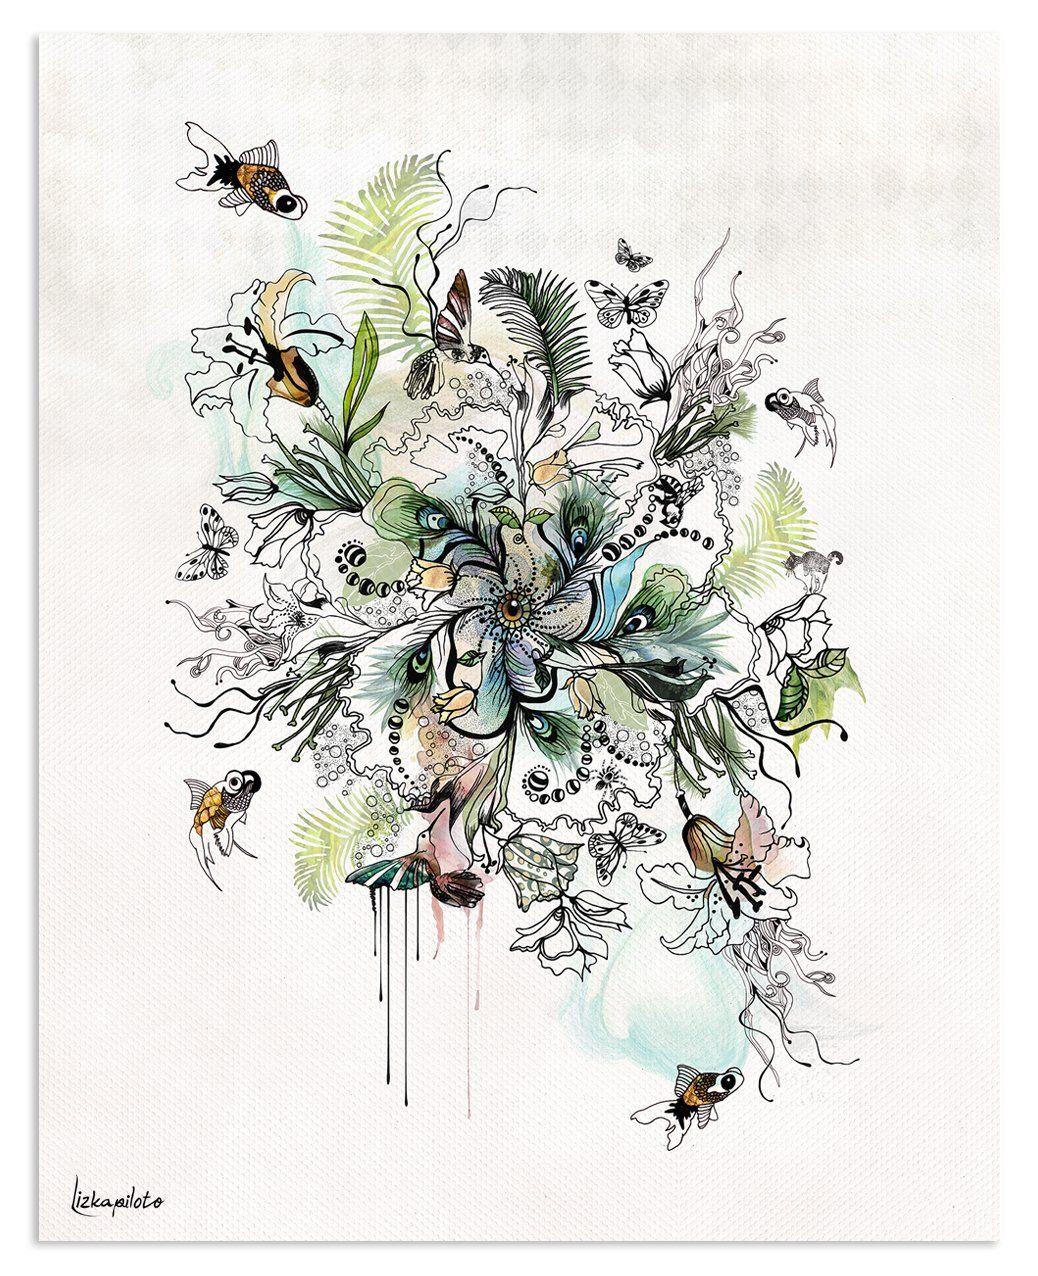 Seaweed Painting - Liz Kapiloto Art & Design - beautifully, detailed abstract art print , boho art with fish, flowers and plants #bohoart #greenart #turquoiseart #turquoise #painting #illustration #artforsale #artist #fishart #inkart #painting #lizkapiloto